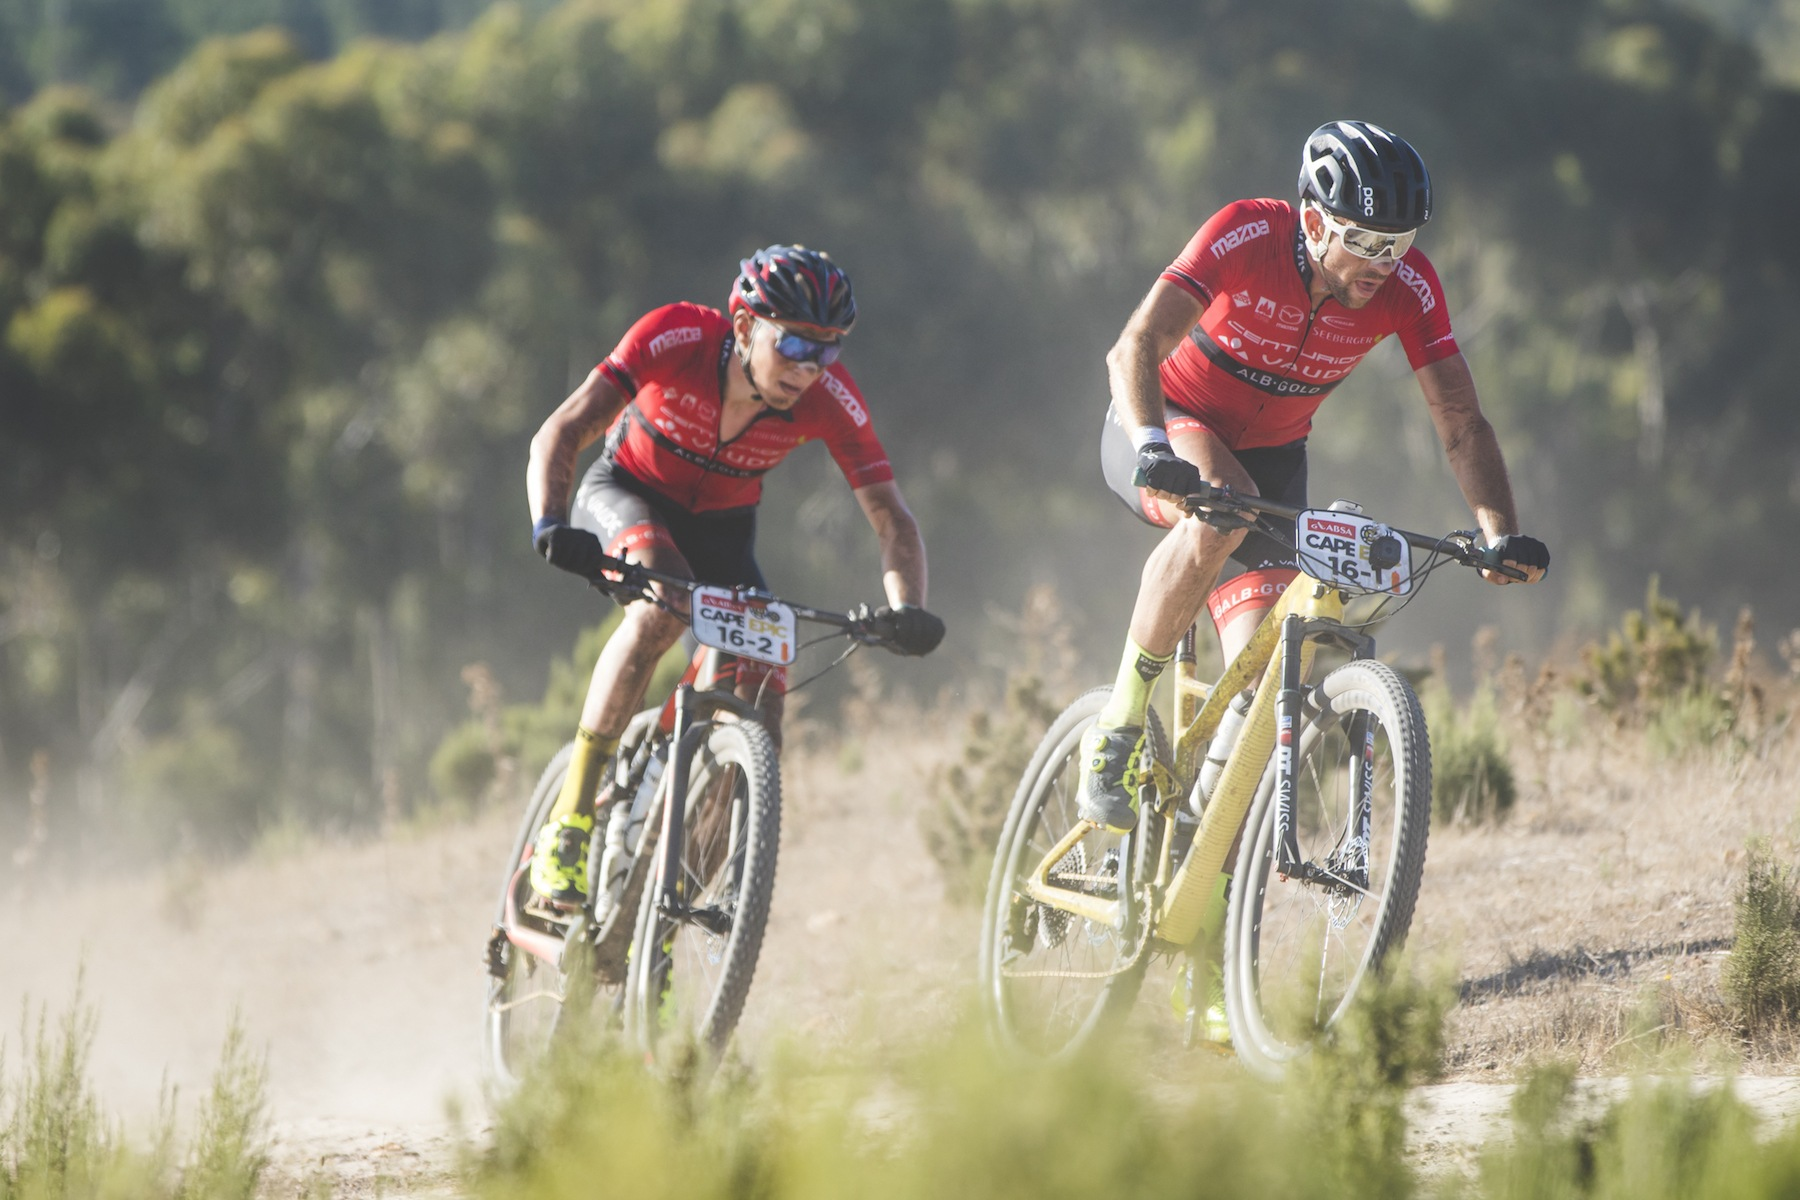 Nicola Rohrbach und Daniel Geismayr. (c) Ewald Sadie/Cape Epic/SPORTZPICS